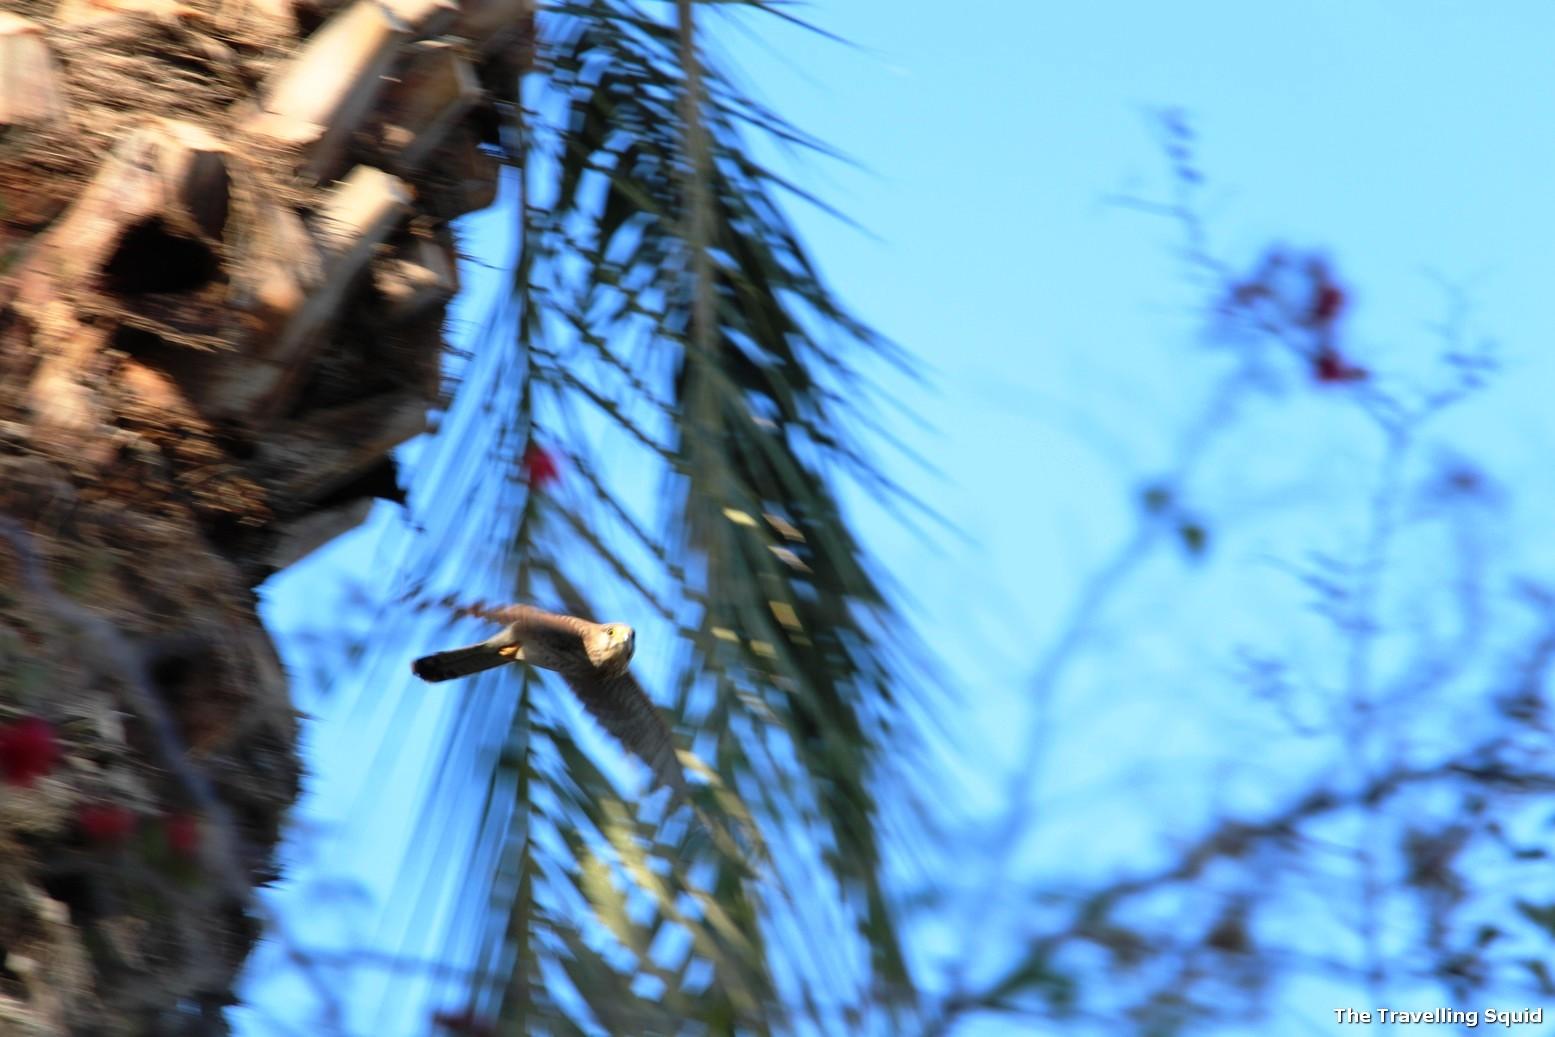 Mount of Beatitudes gardens bird